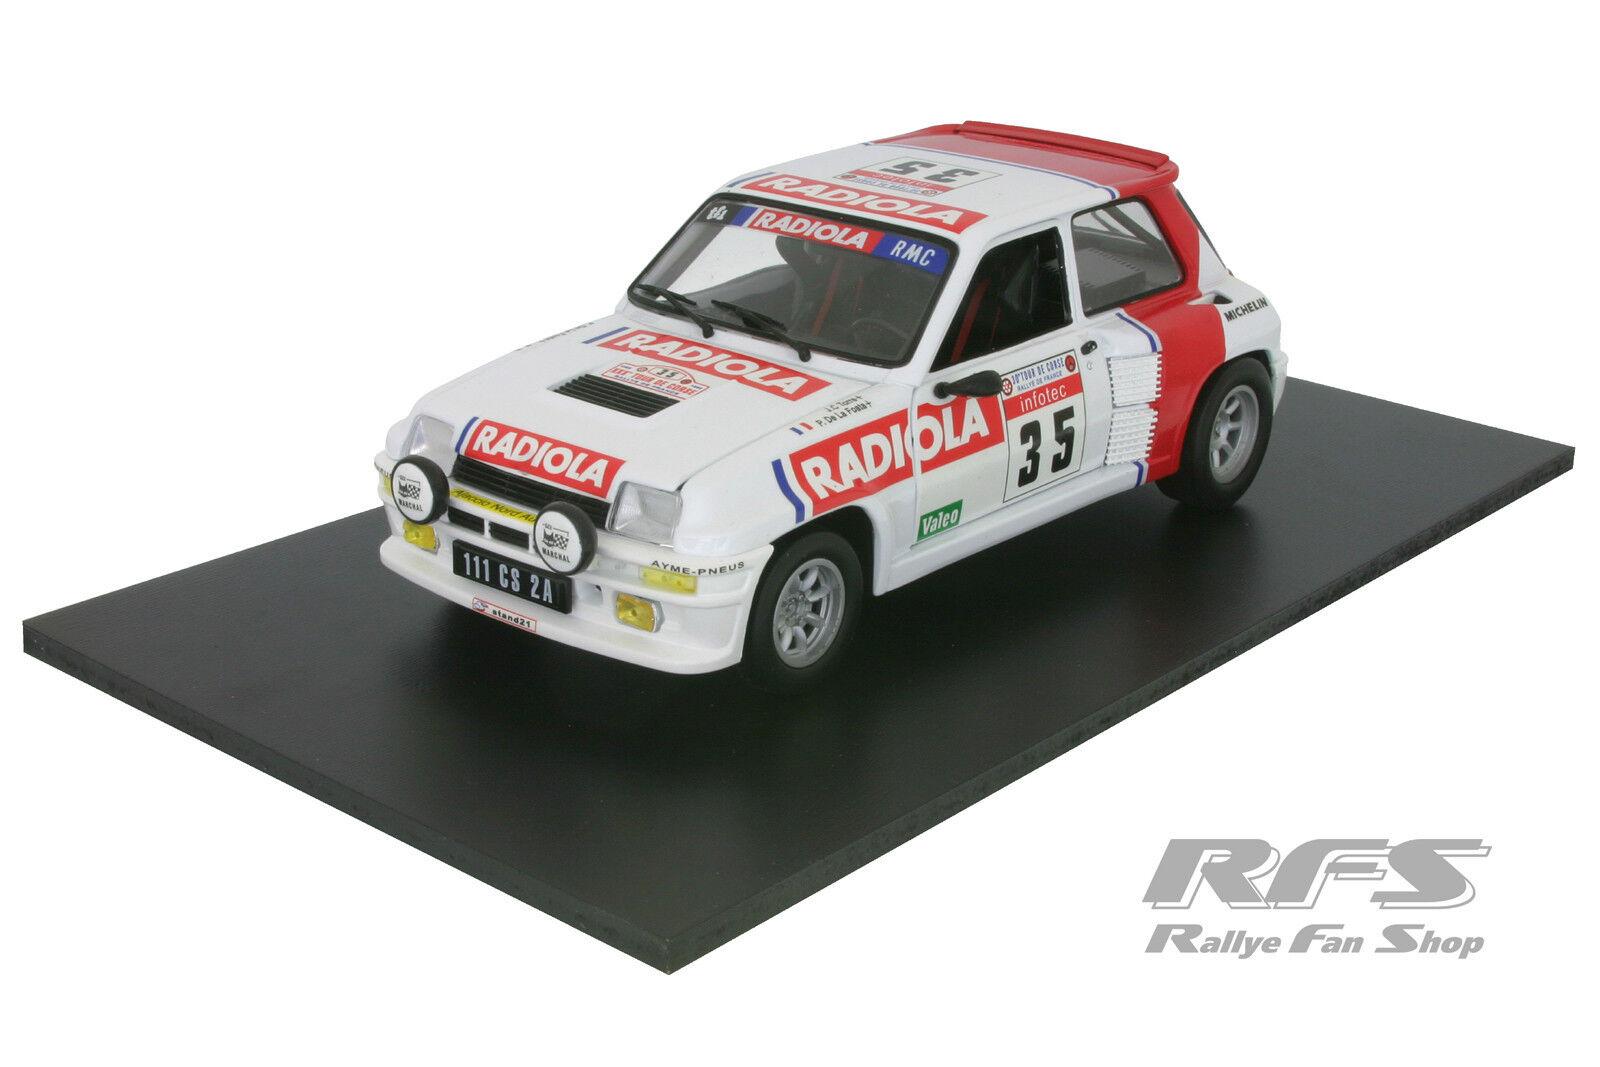 RENAULT 5 TURBO-Torre/de La Foata-Rally Tour de Corse 1986 - 1:18 UH 4545